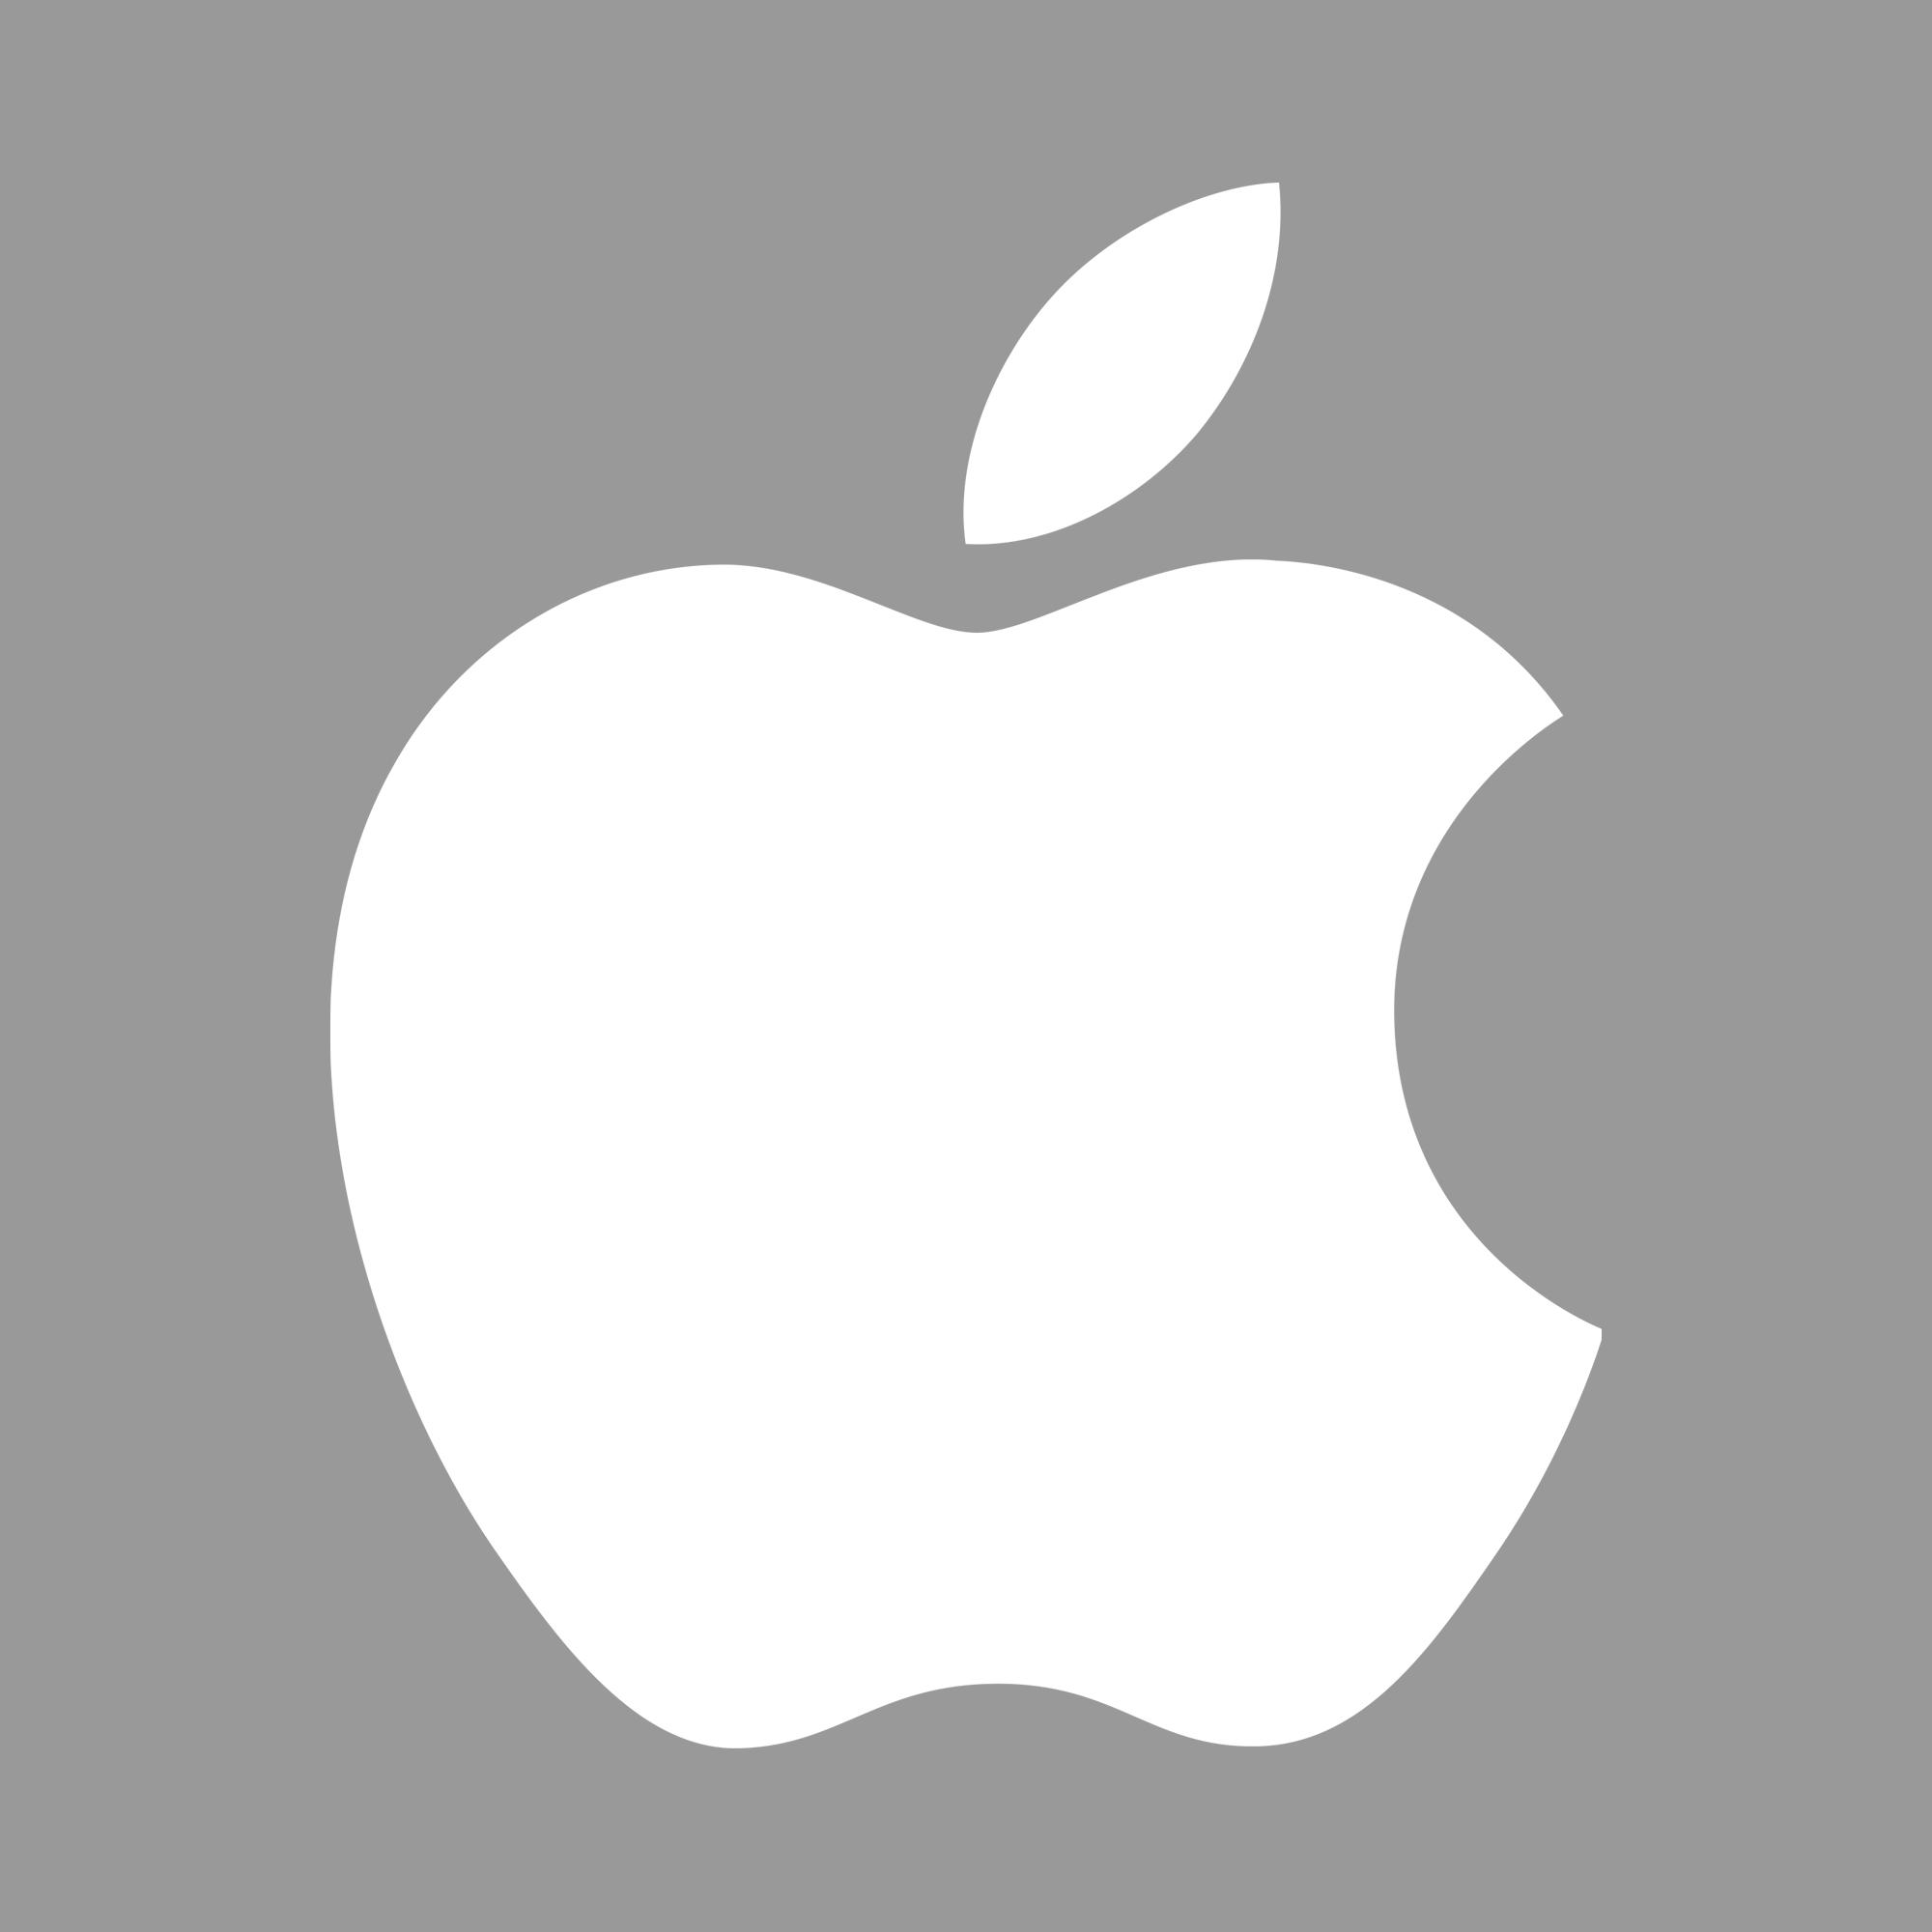 Apple: New High After Blowout - Apple Inc. (NASDAQ:AAPL) | Seeking ...